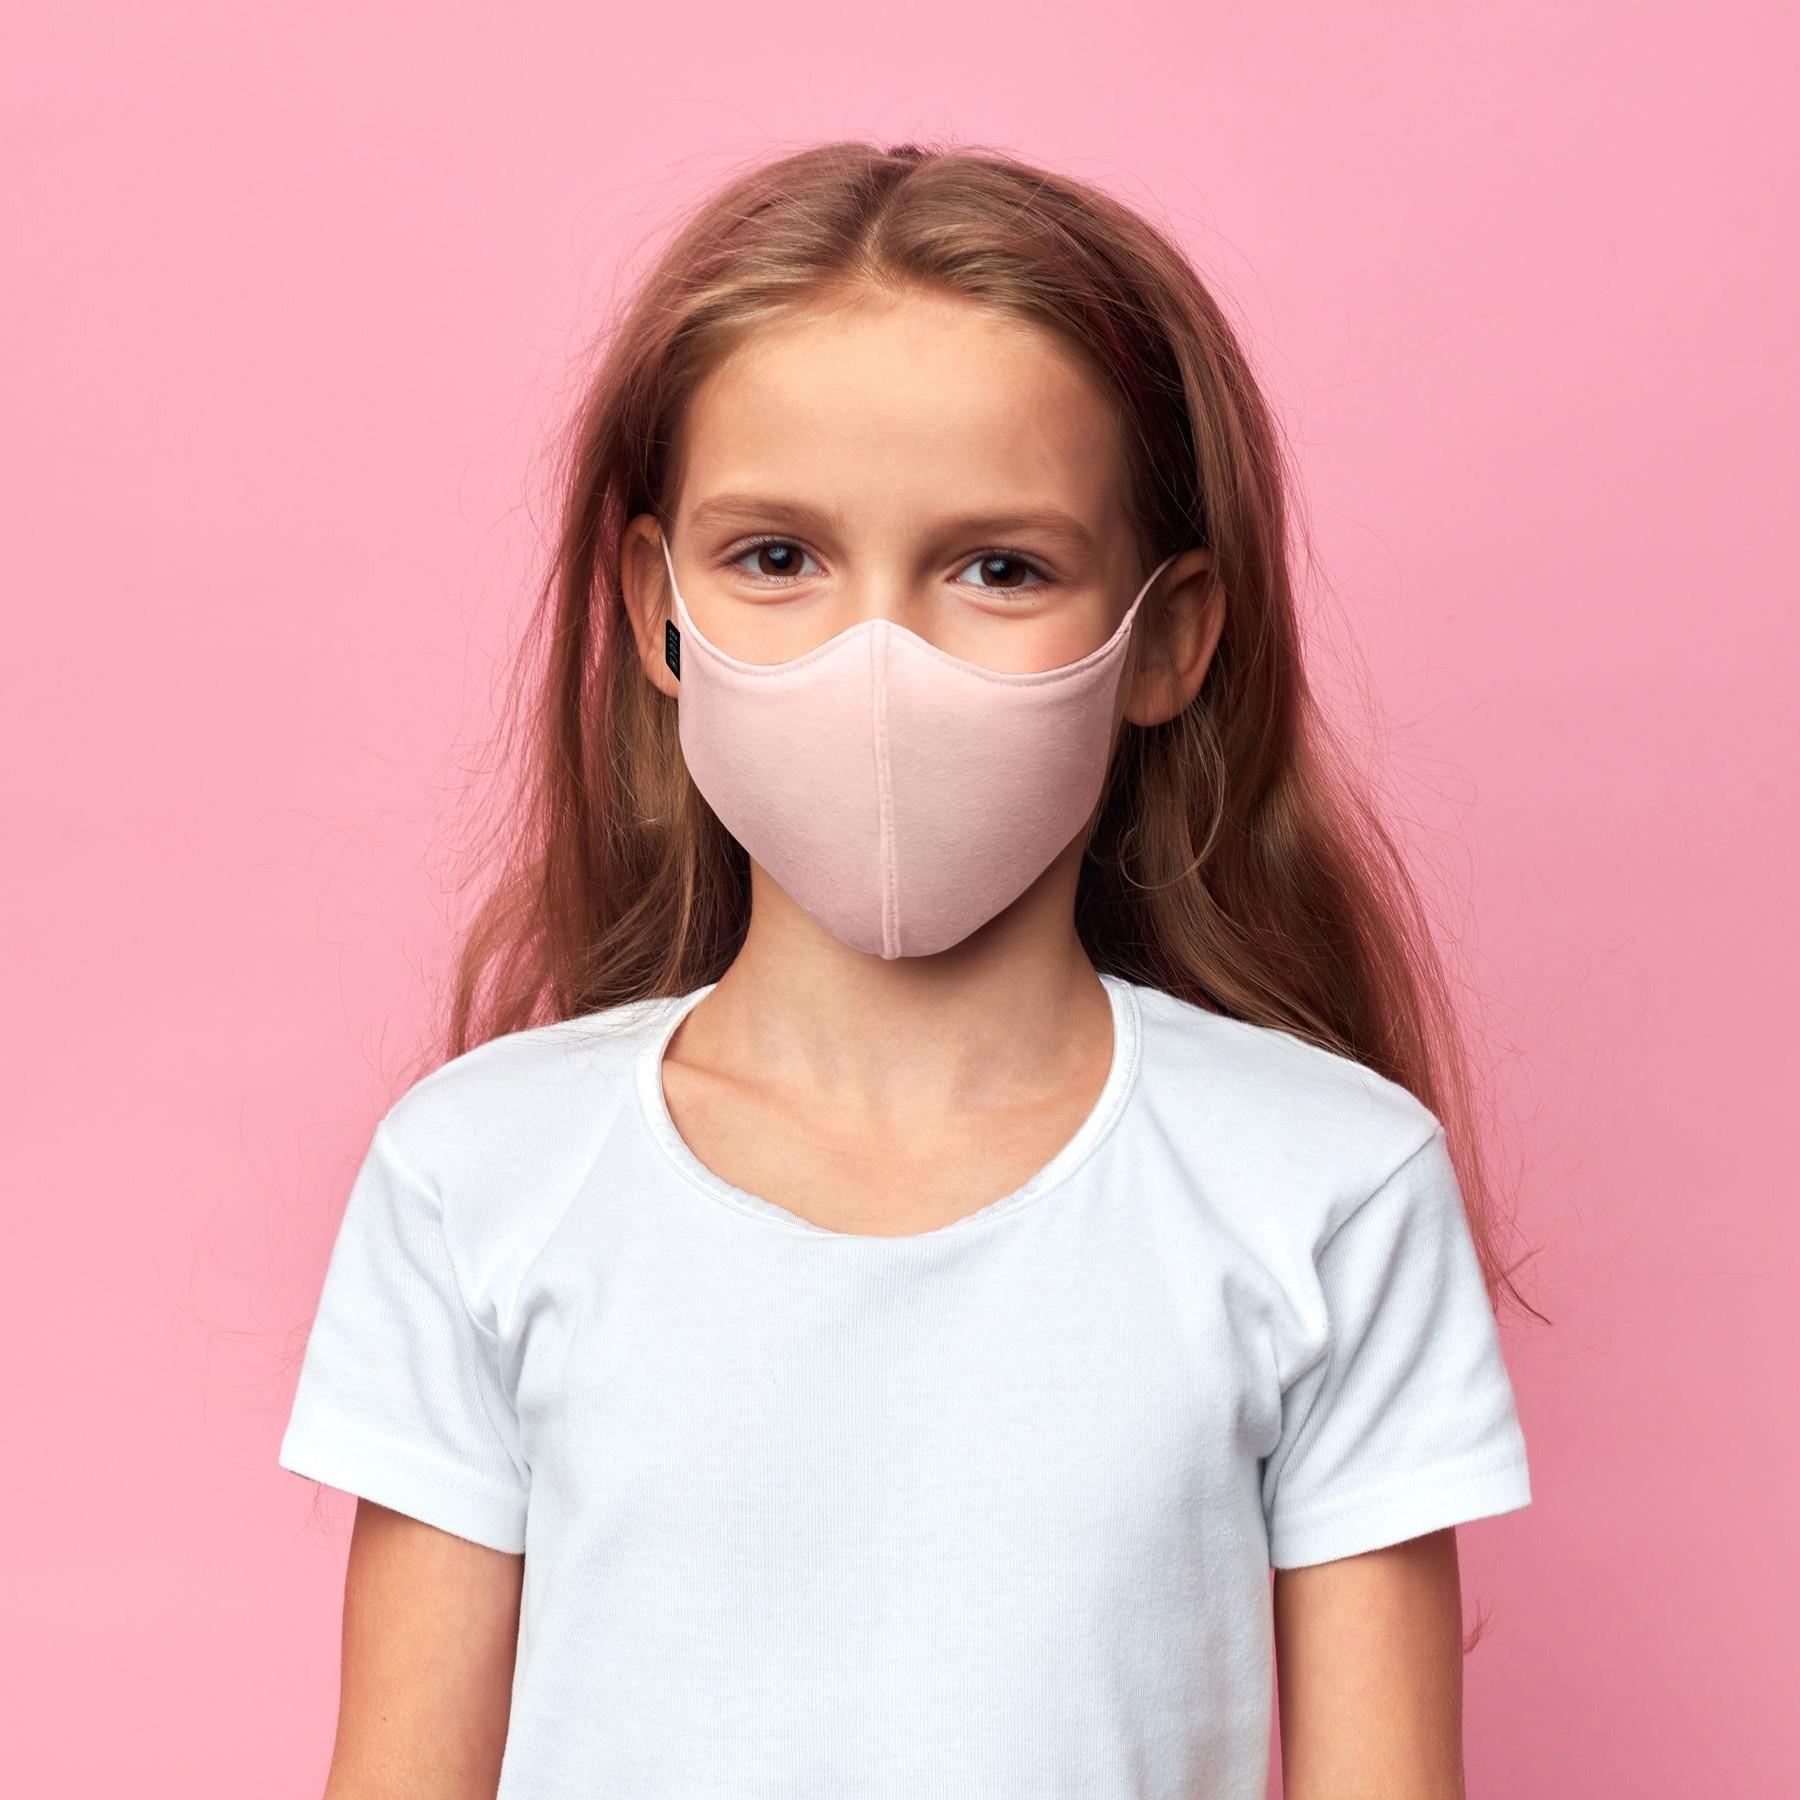 Bloch B-Safe Childs Face Mask 3 Pack Light Pink